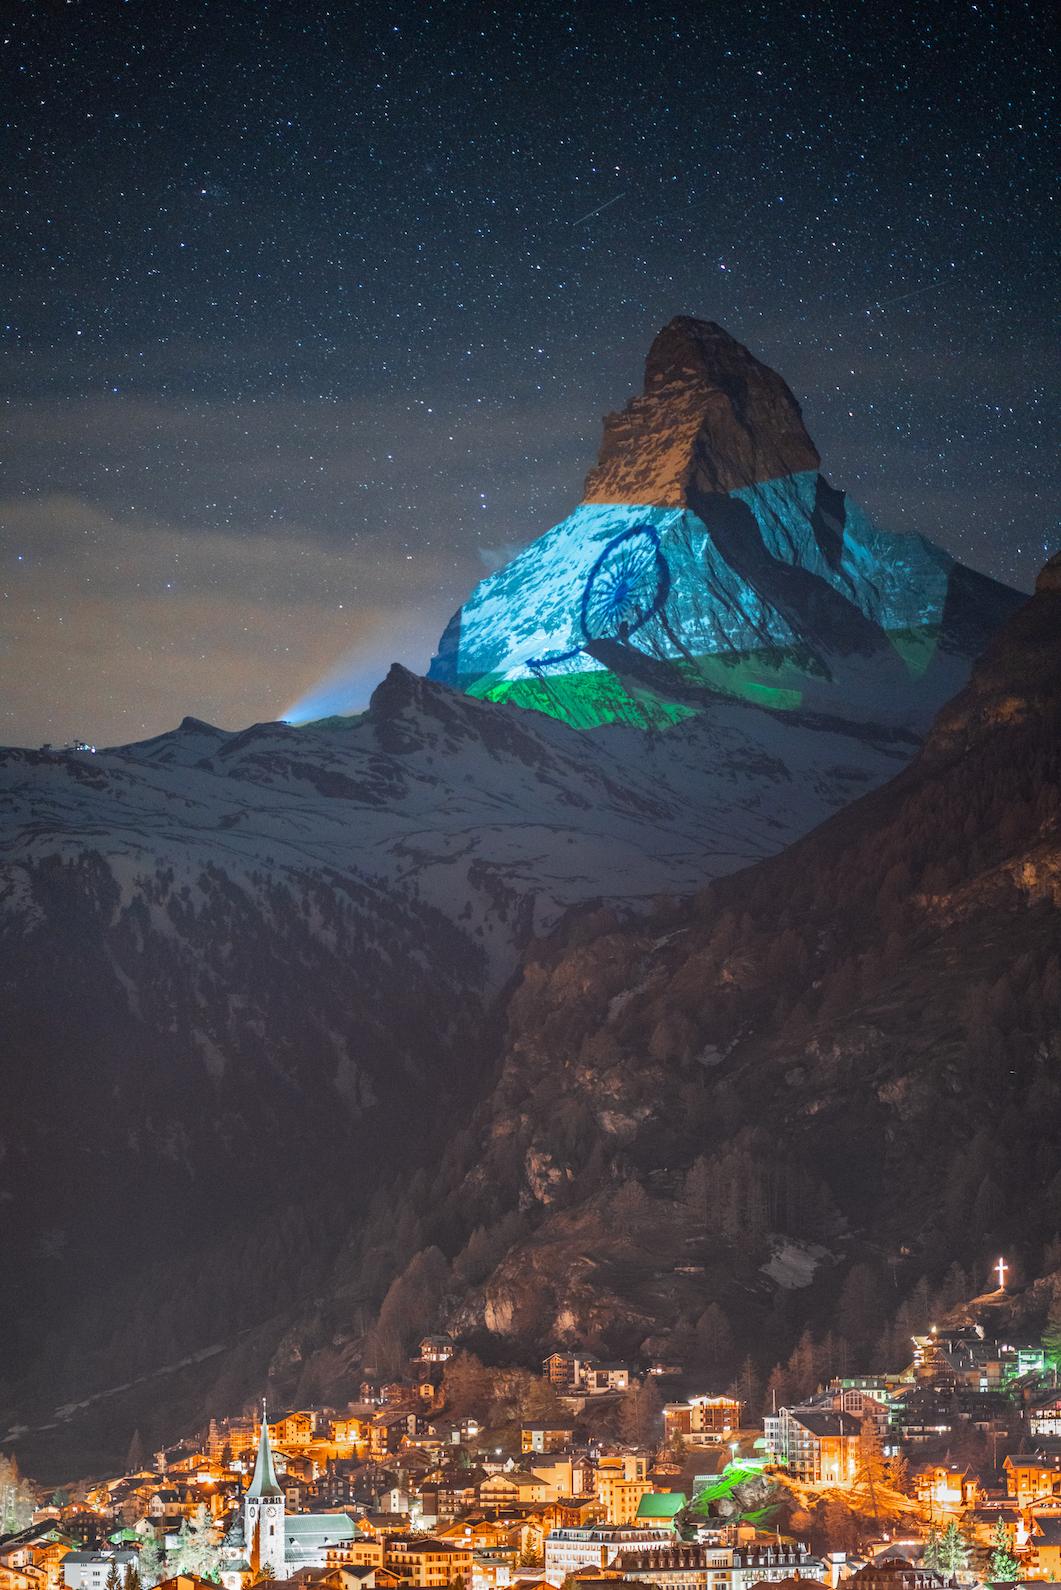 ndian flag projected onto Matterhorn in Zermatt to show solidarity against coronavirus Photo courtesy: Copyrights ©️ Light Art by Gerry Hofstetter | Photograph by Gabriel Perren